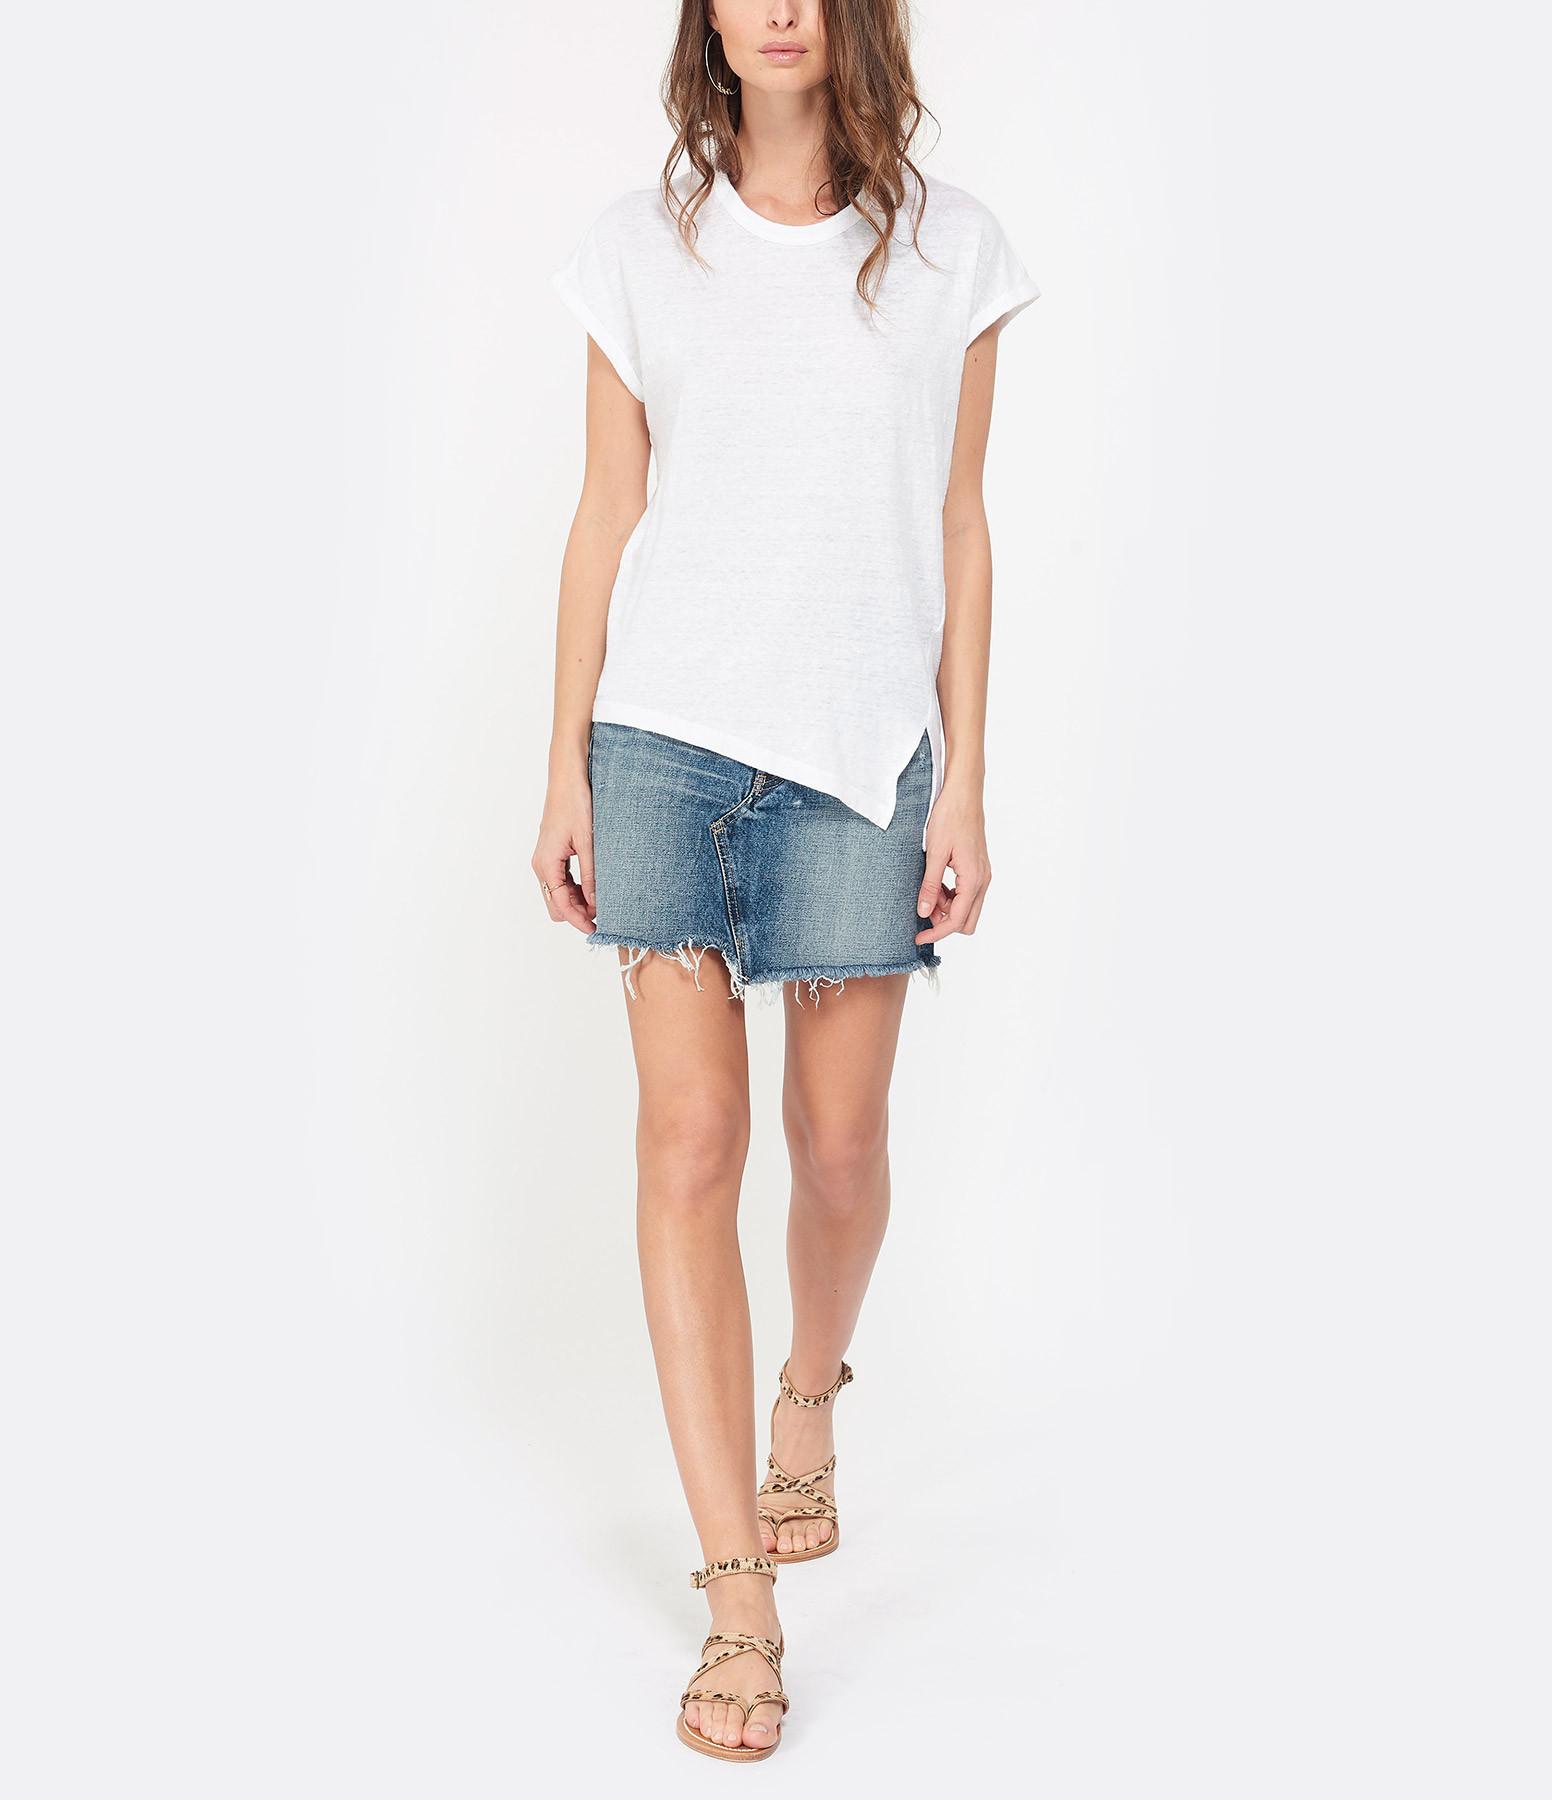 ISABEL MARANT ÉTOILE - Tee-shirt Kella Lin Blanc